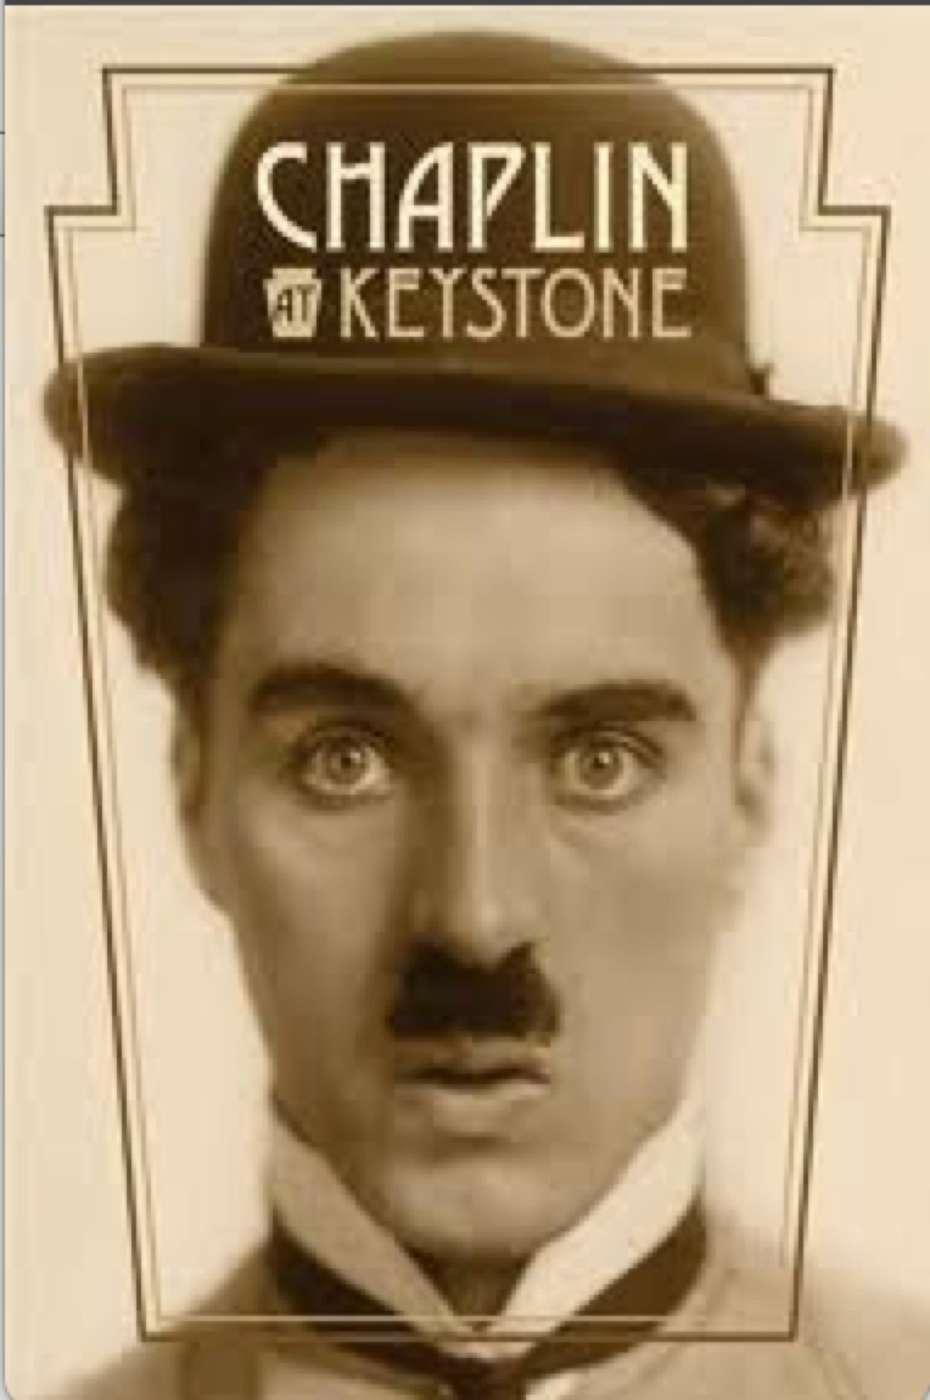 Chaplin at Keystone kapak